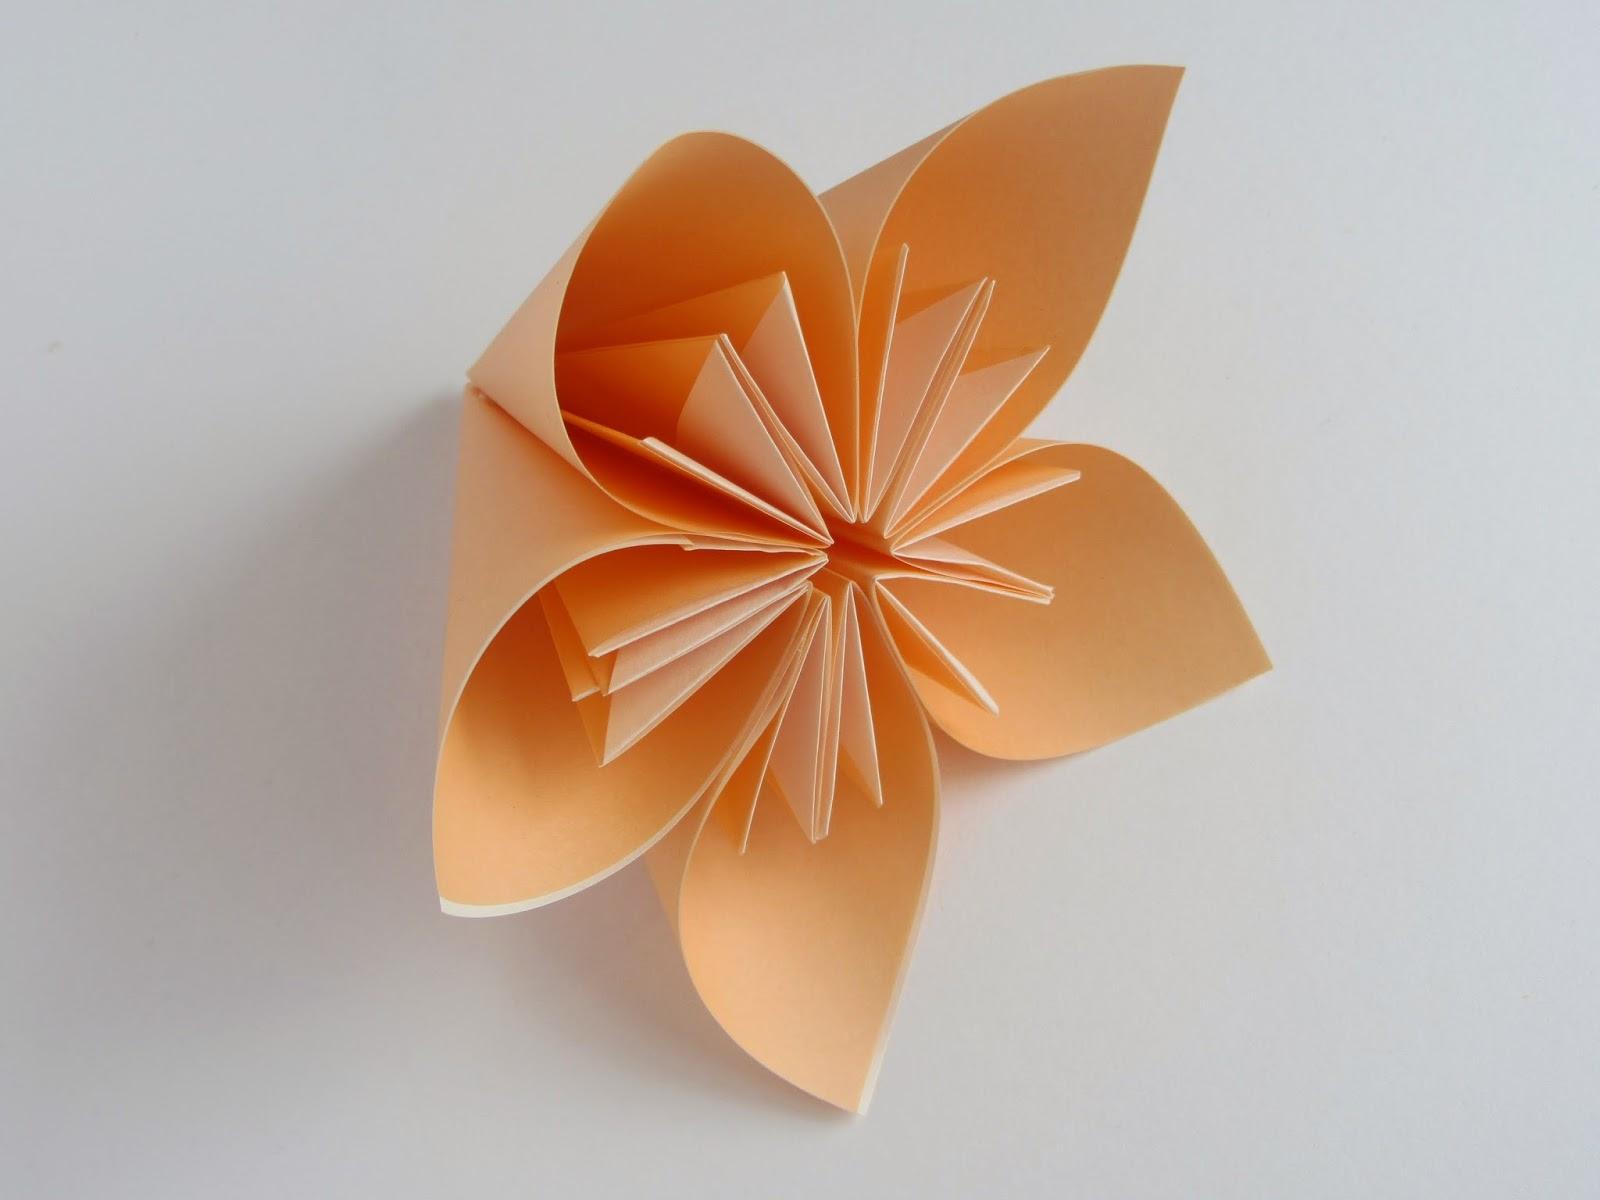 Projects art and craft easy origami kusudama flower without glue origami kusudama flower without glue mightylinksfo